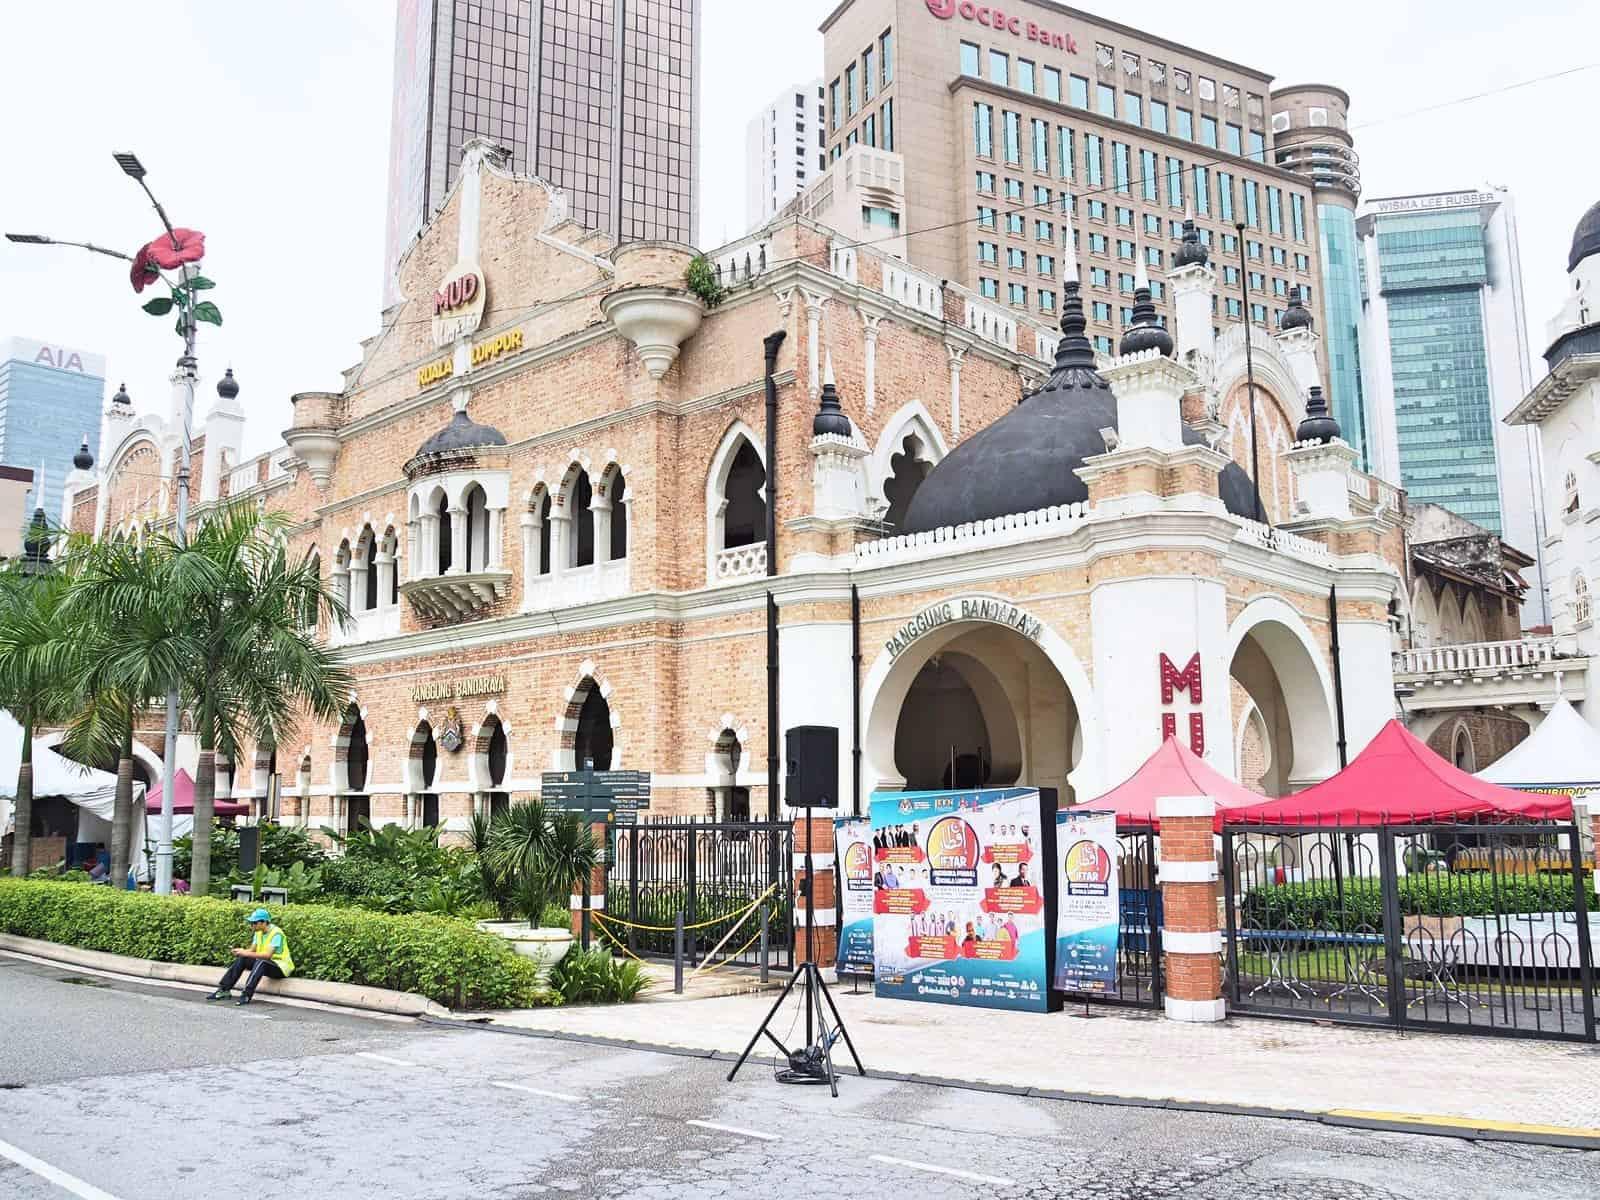 DBKL-City-Theatre-Merdeka-Square-Kuala-Lumpur-Malaysia ] Travel Mermaid